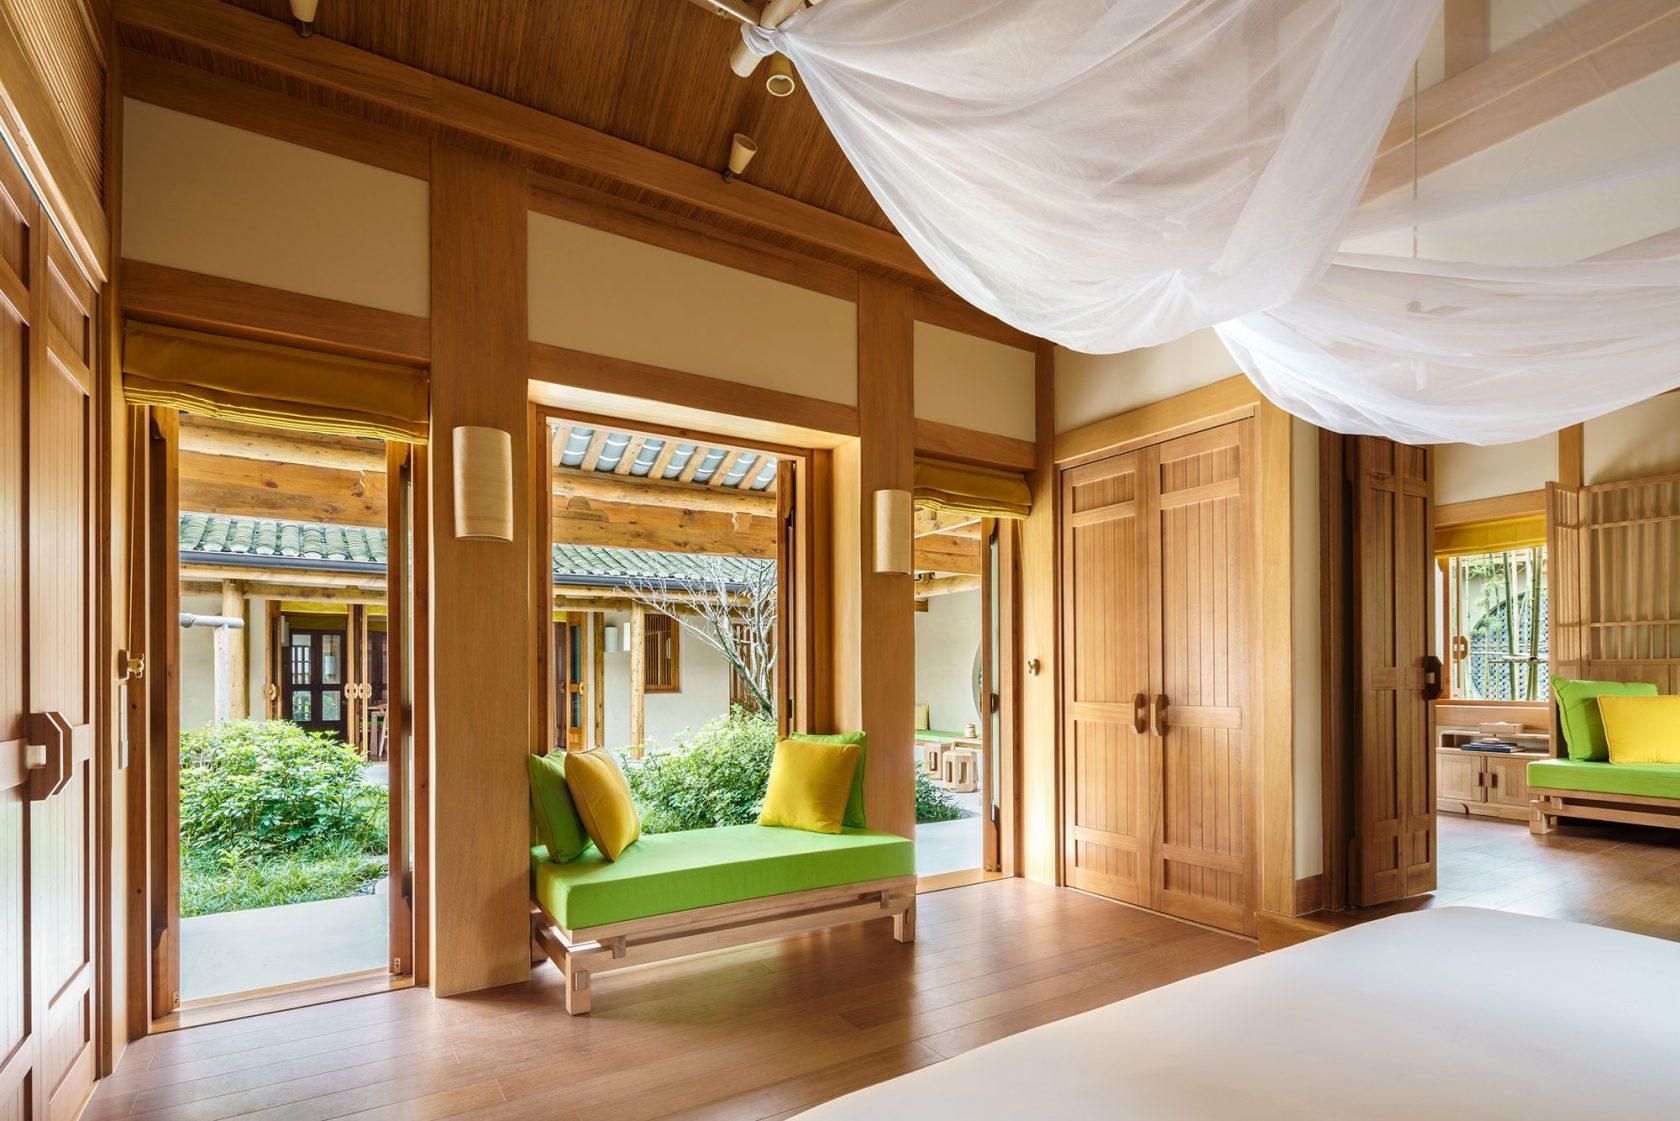 Six Senses Qing Cheng Mountain Two Bedroom Deluxe Courtyard Villa